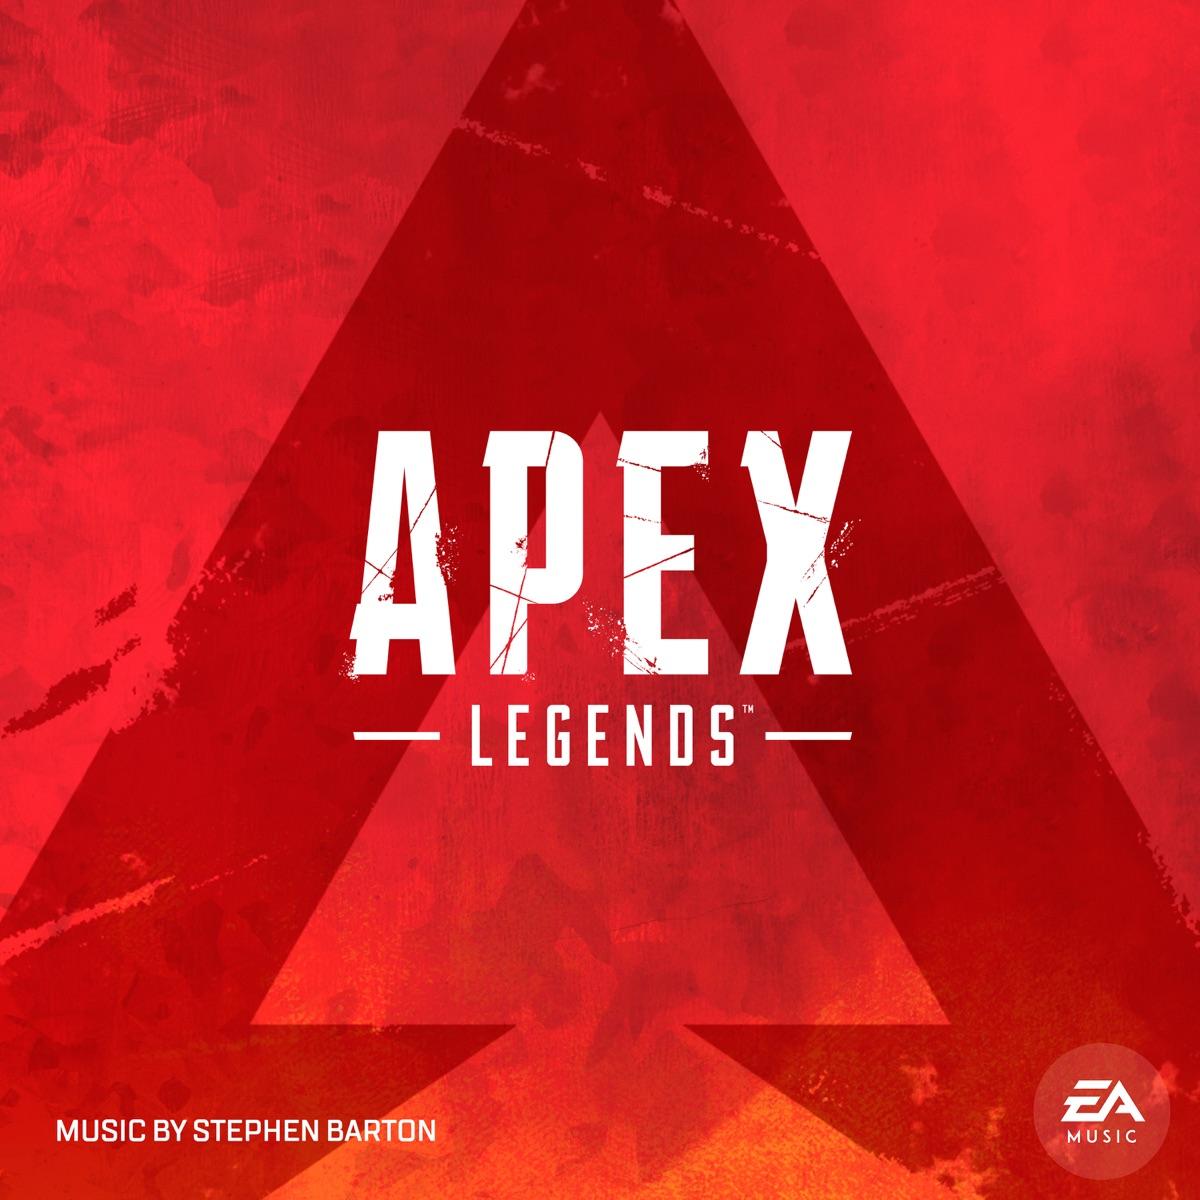 Apex Legends Album Cover By Stephen Barton